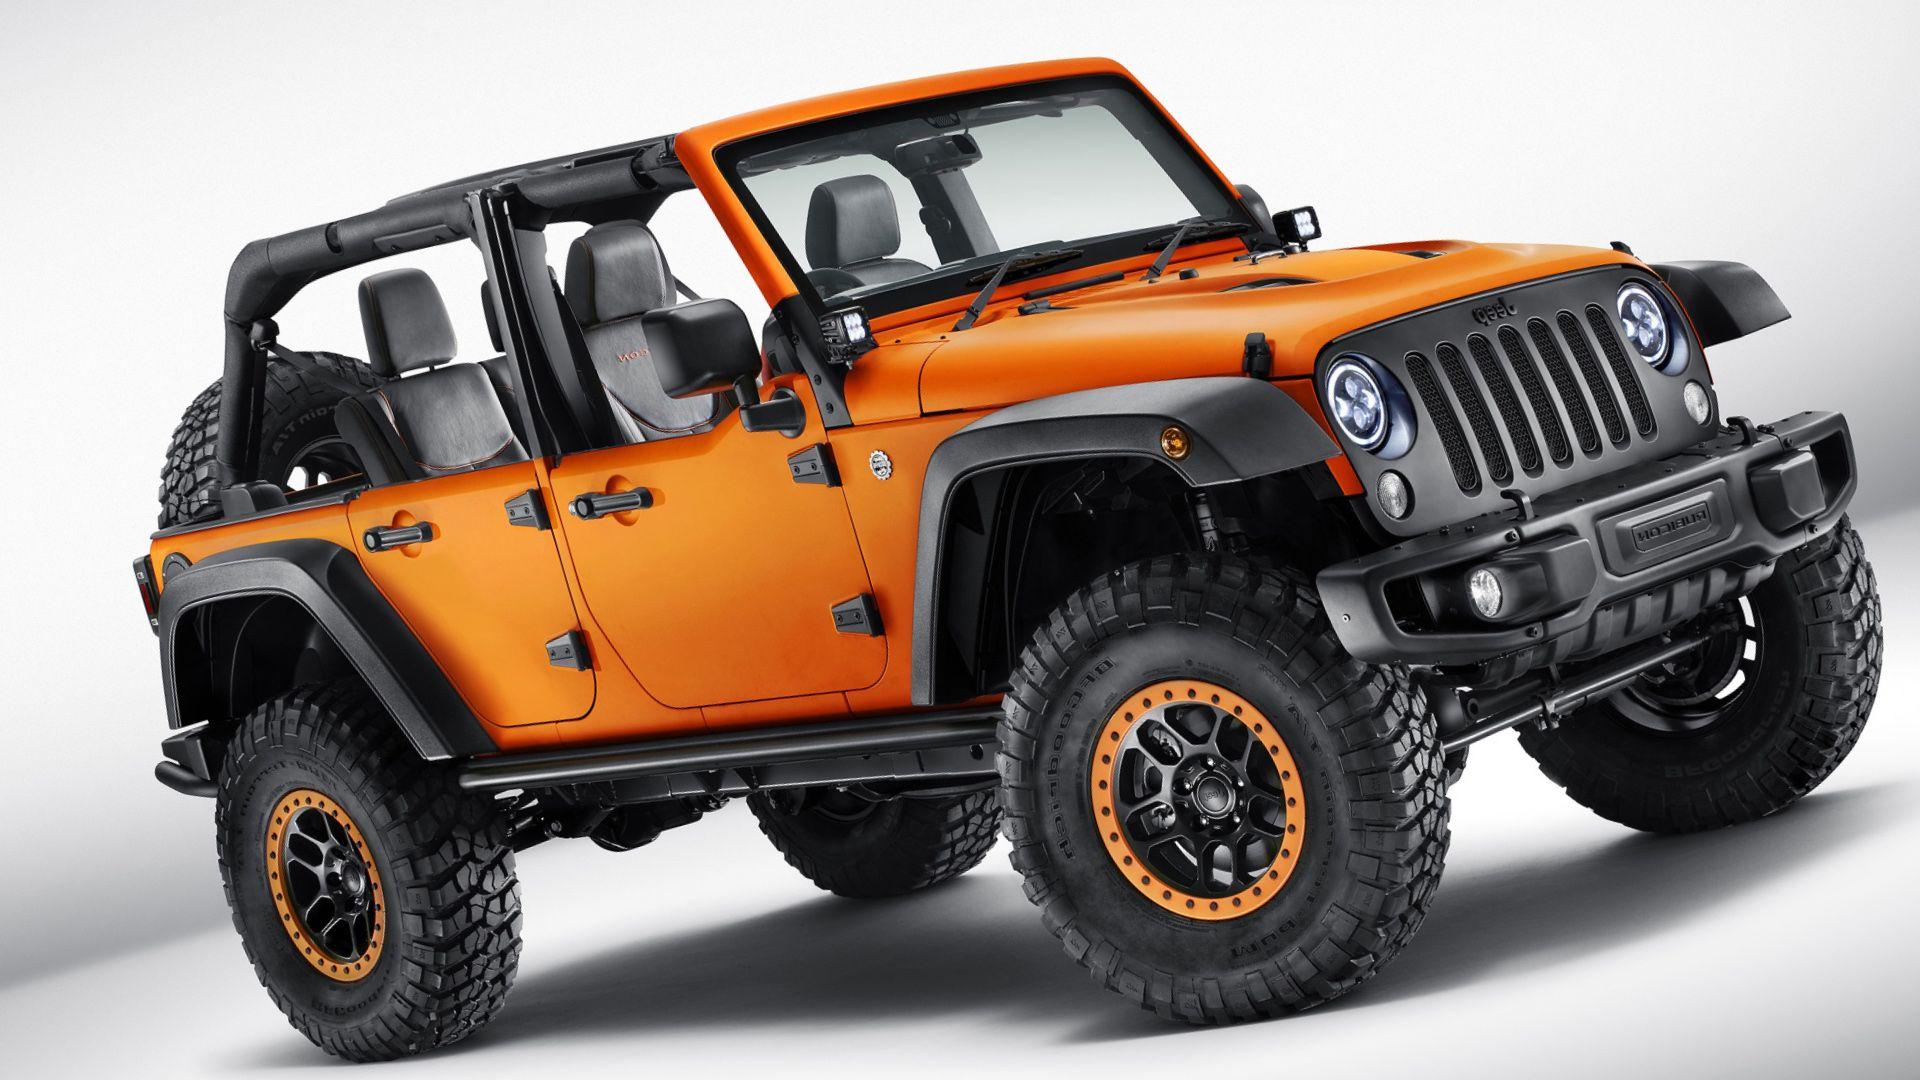 Jeep Wrangler Jk Wrangler Unlimited Jk Jeep Wrangler Jeep Scrambler 2018 Jeep Wrangler